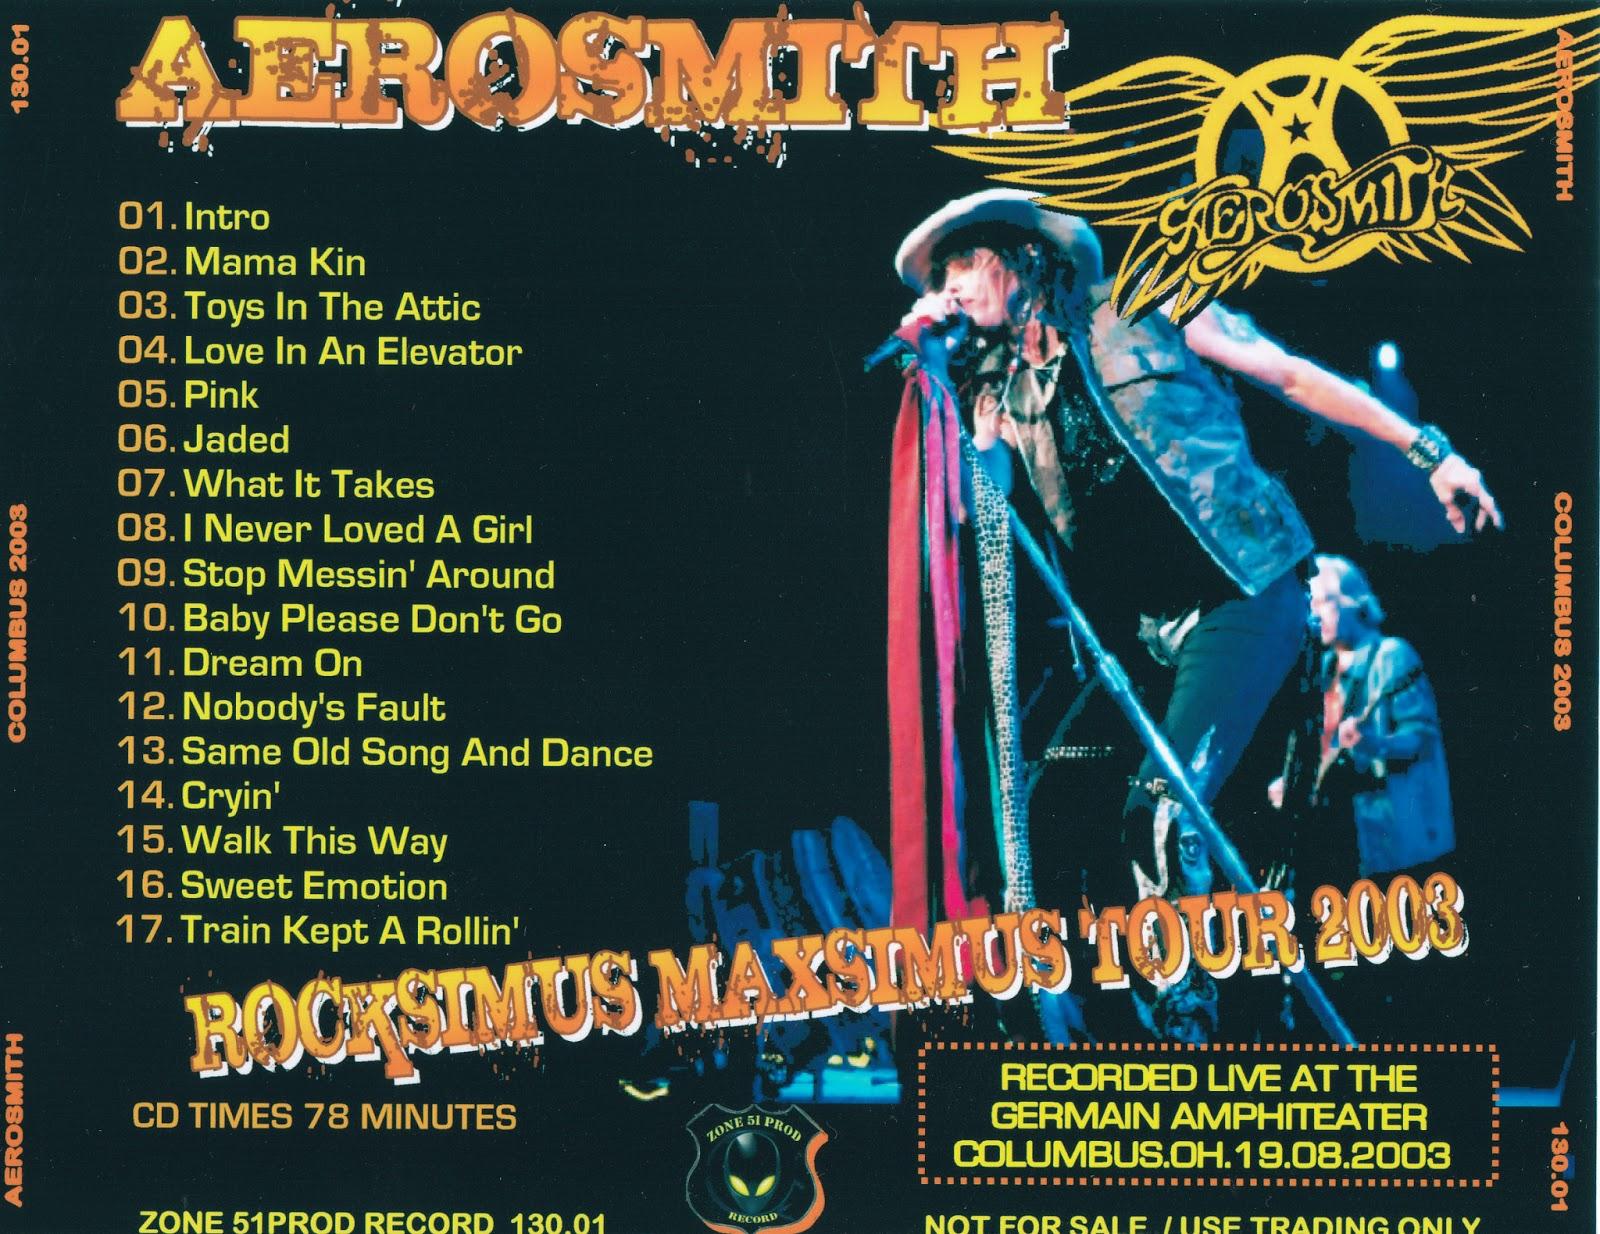 Aerosmith Bootlegs Cover Arts Columbus 2003